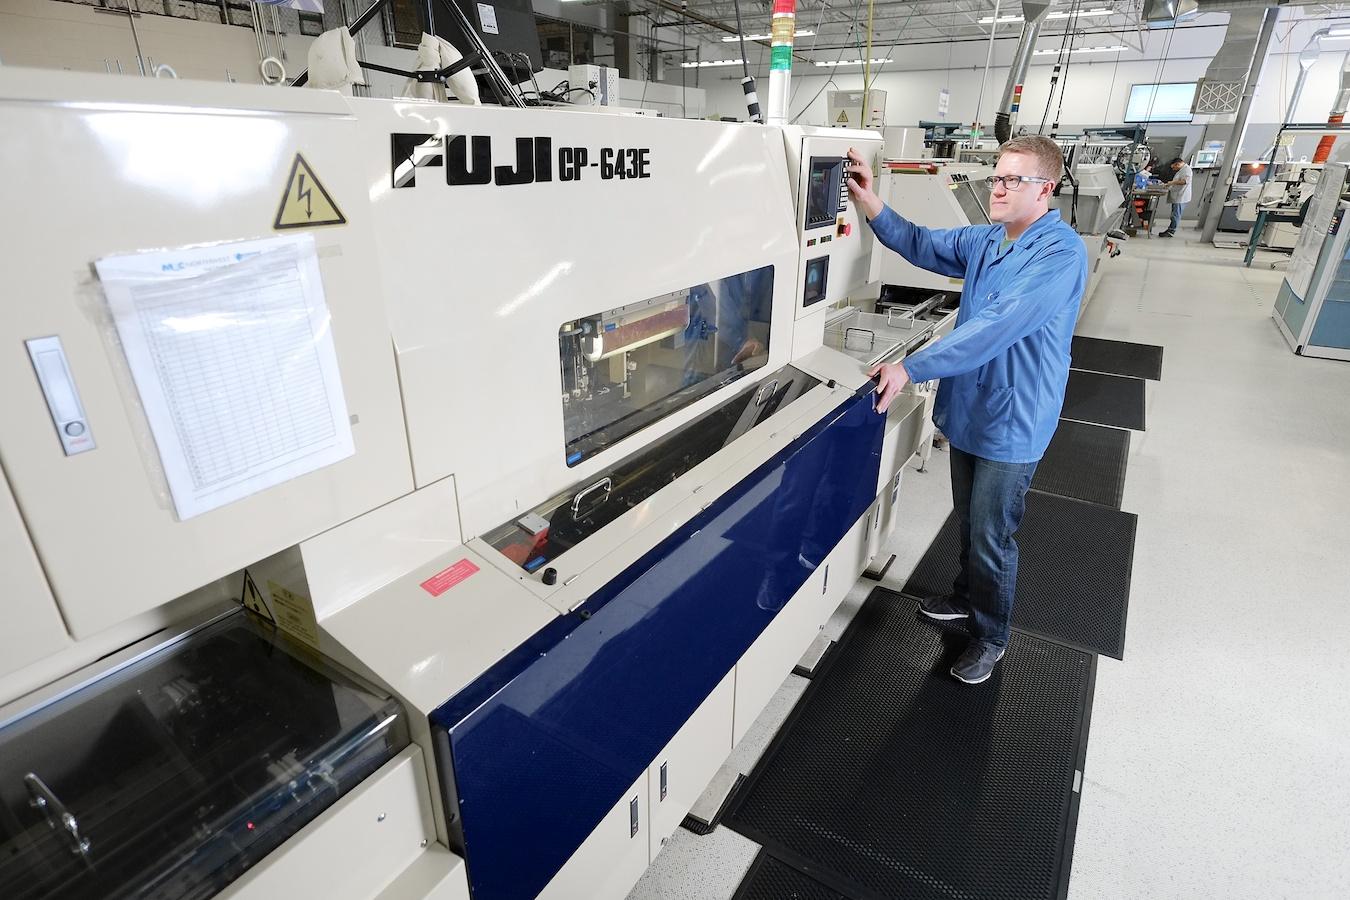 Fujifilm XE-1, Zeiss Touit 12mm, ISO 800, f/2.8, 1/125.